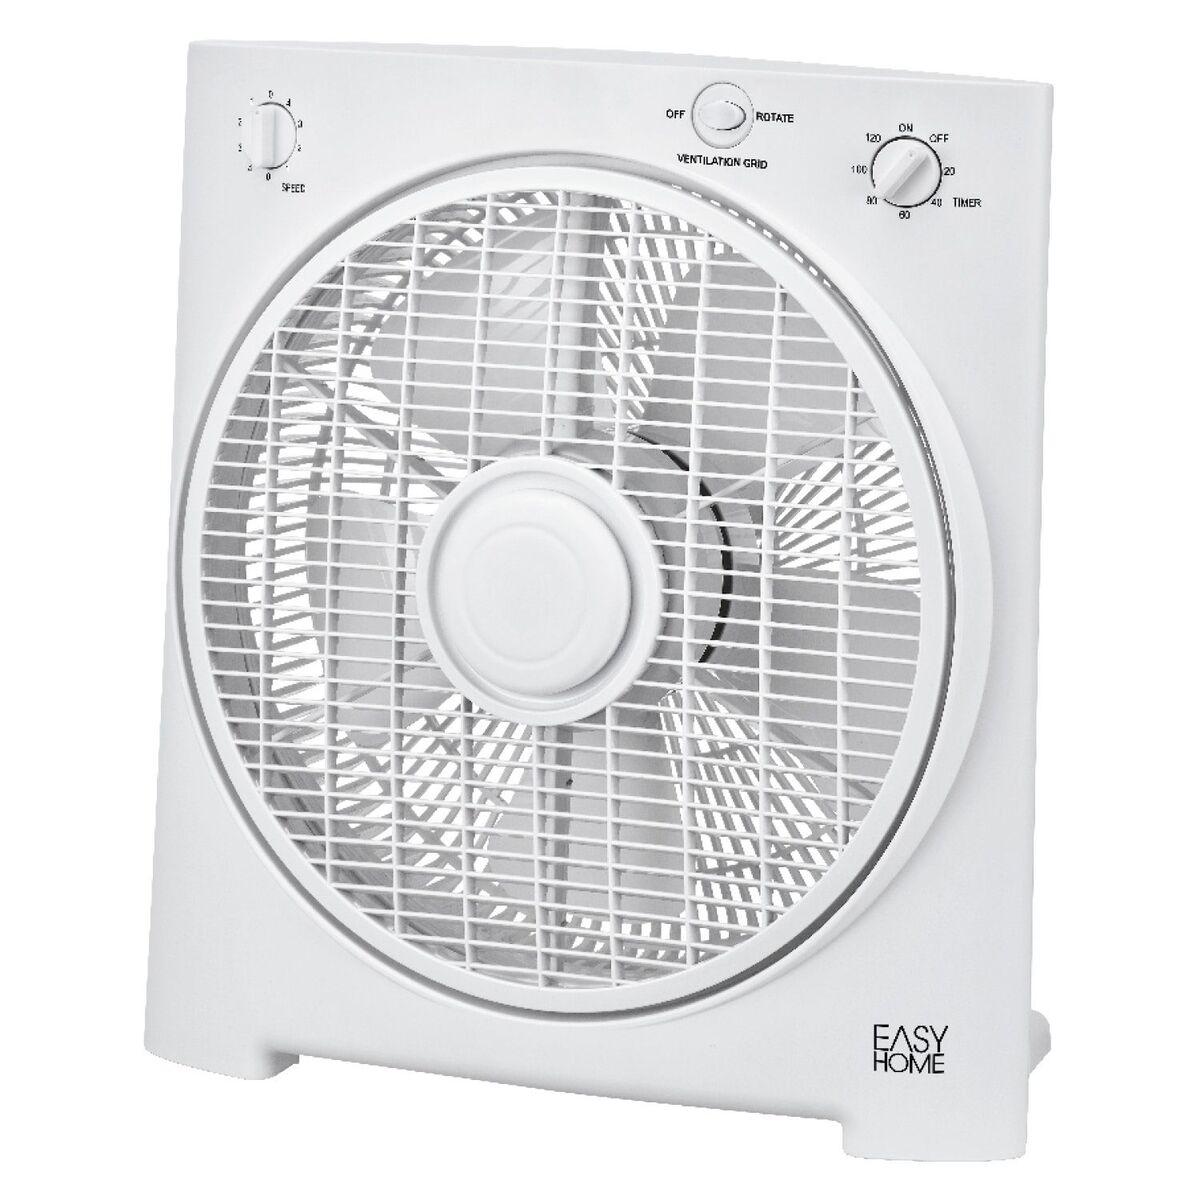 Bild 2 von EASY HOME®  Box-Ventilator